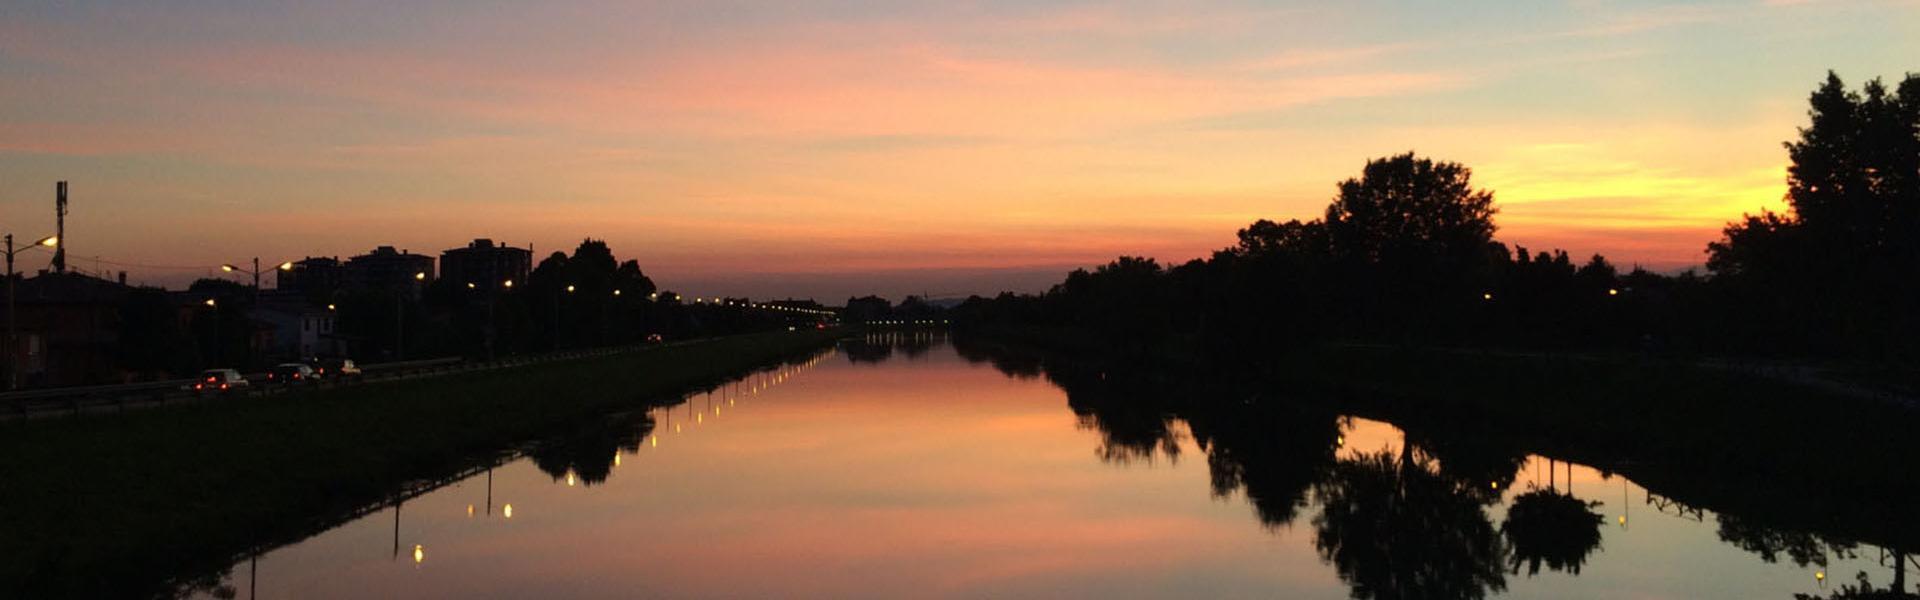 Padova Travel Vie d'acqua ©Beatrice Alfieri